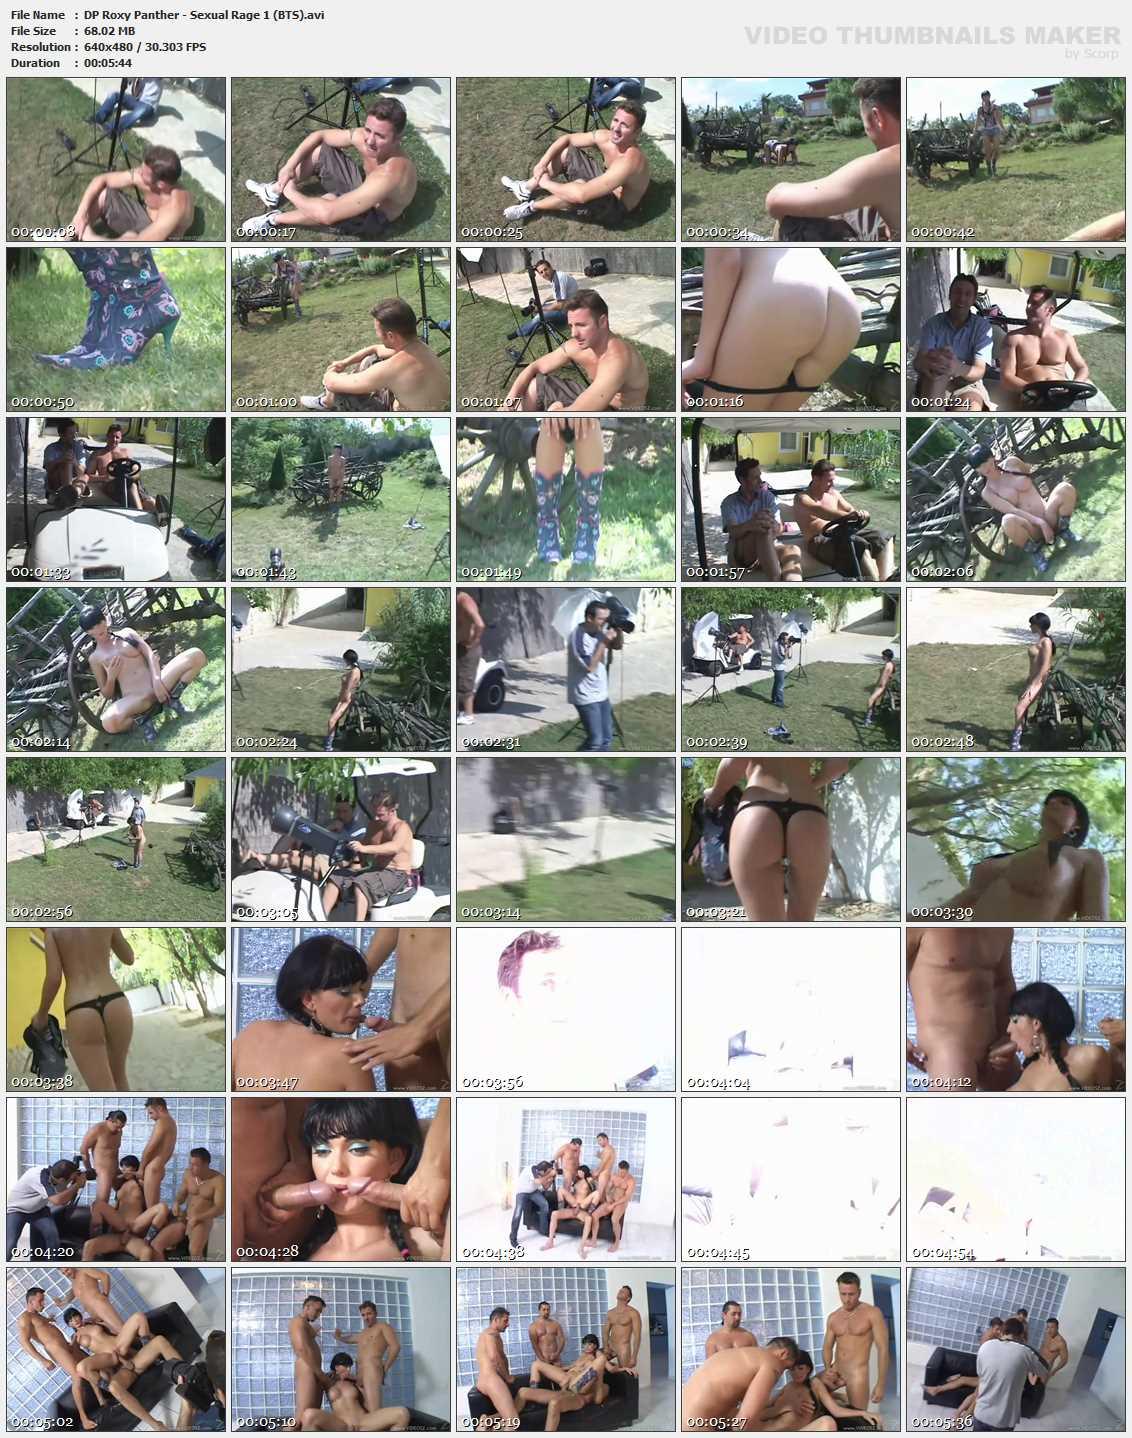 521372104_DPRoxyPanther_SexualRage1BTS.avi_123_420lo.jpg